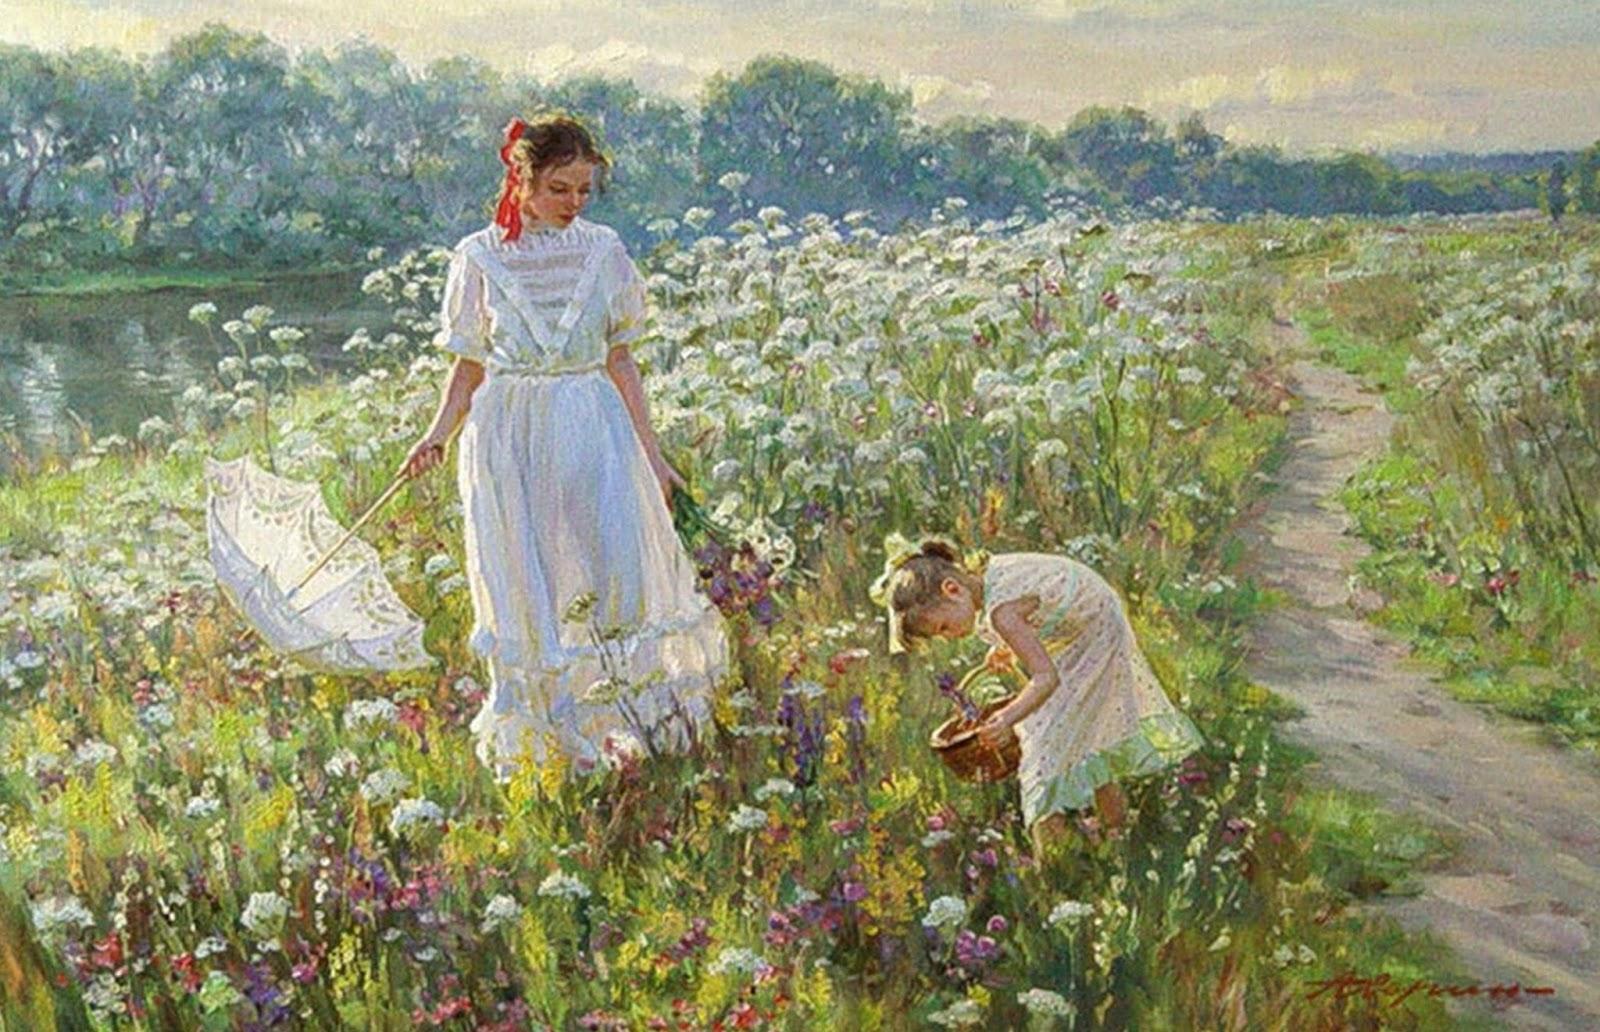 Pinturas cuadros lienzos pinturas impresionistas paisajes - Oleos de jardines ...